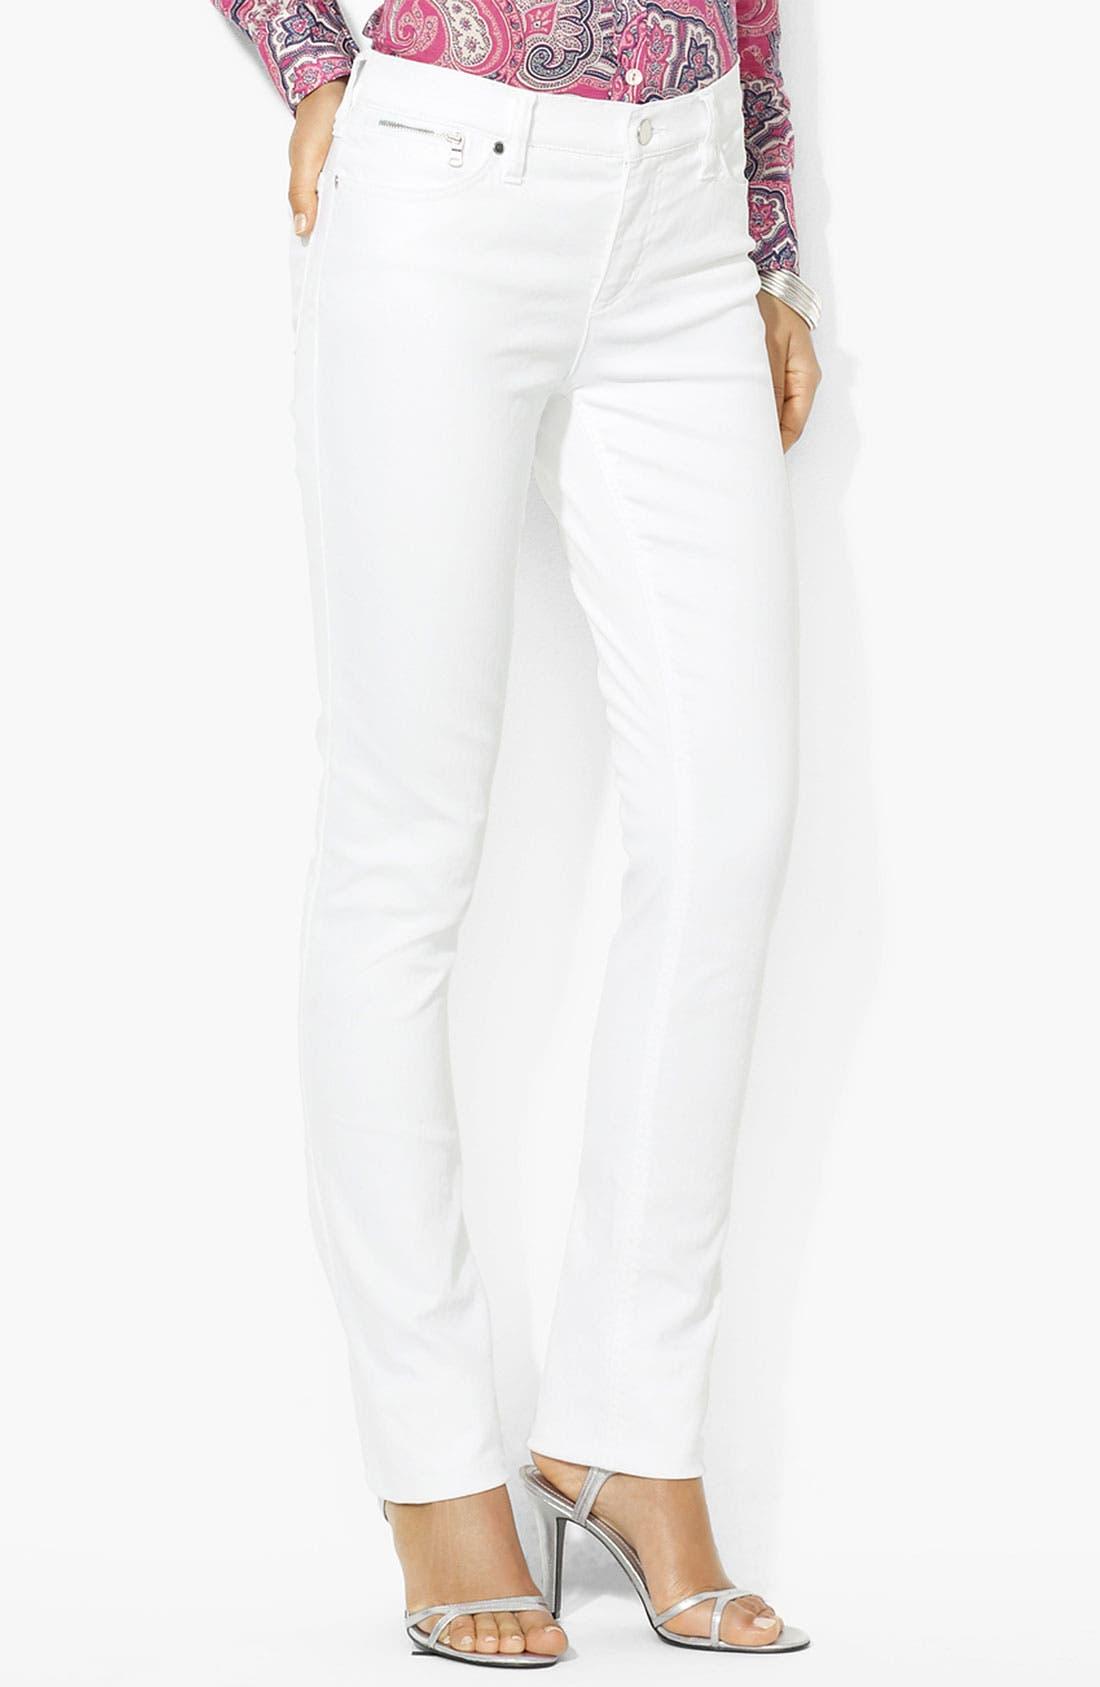 Alternate Image 1 Selected - Lauren Ralph Lauren Slim Straight Leg Pants